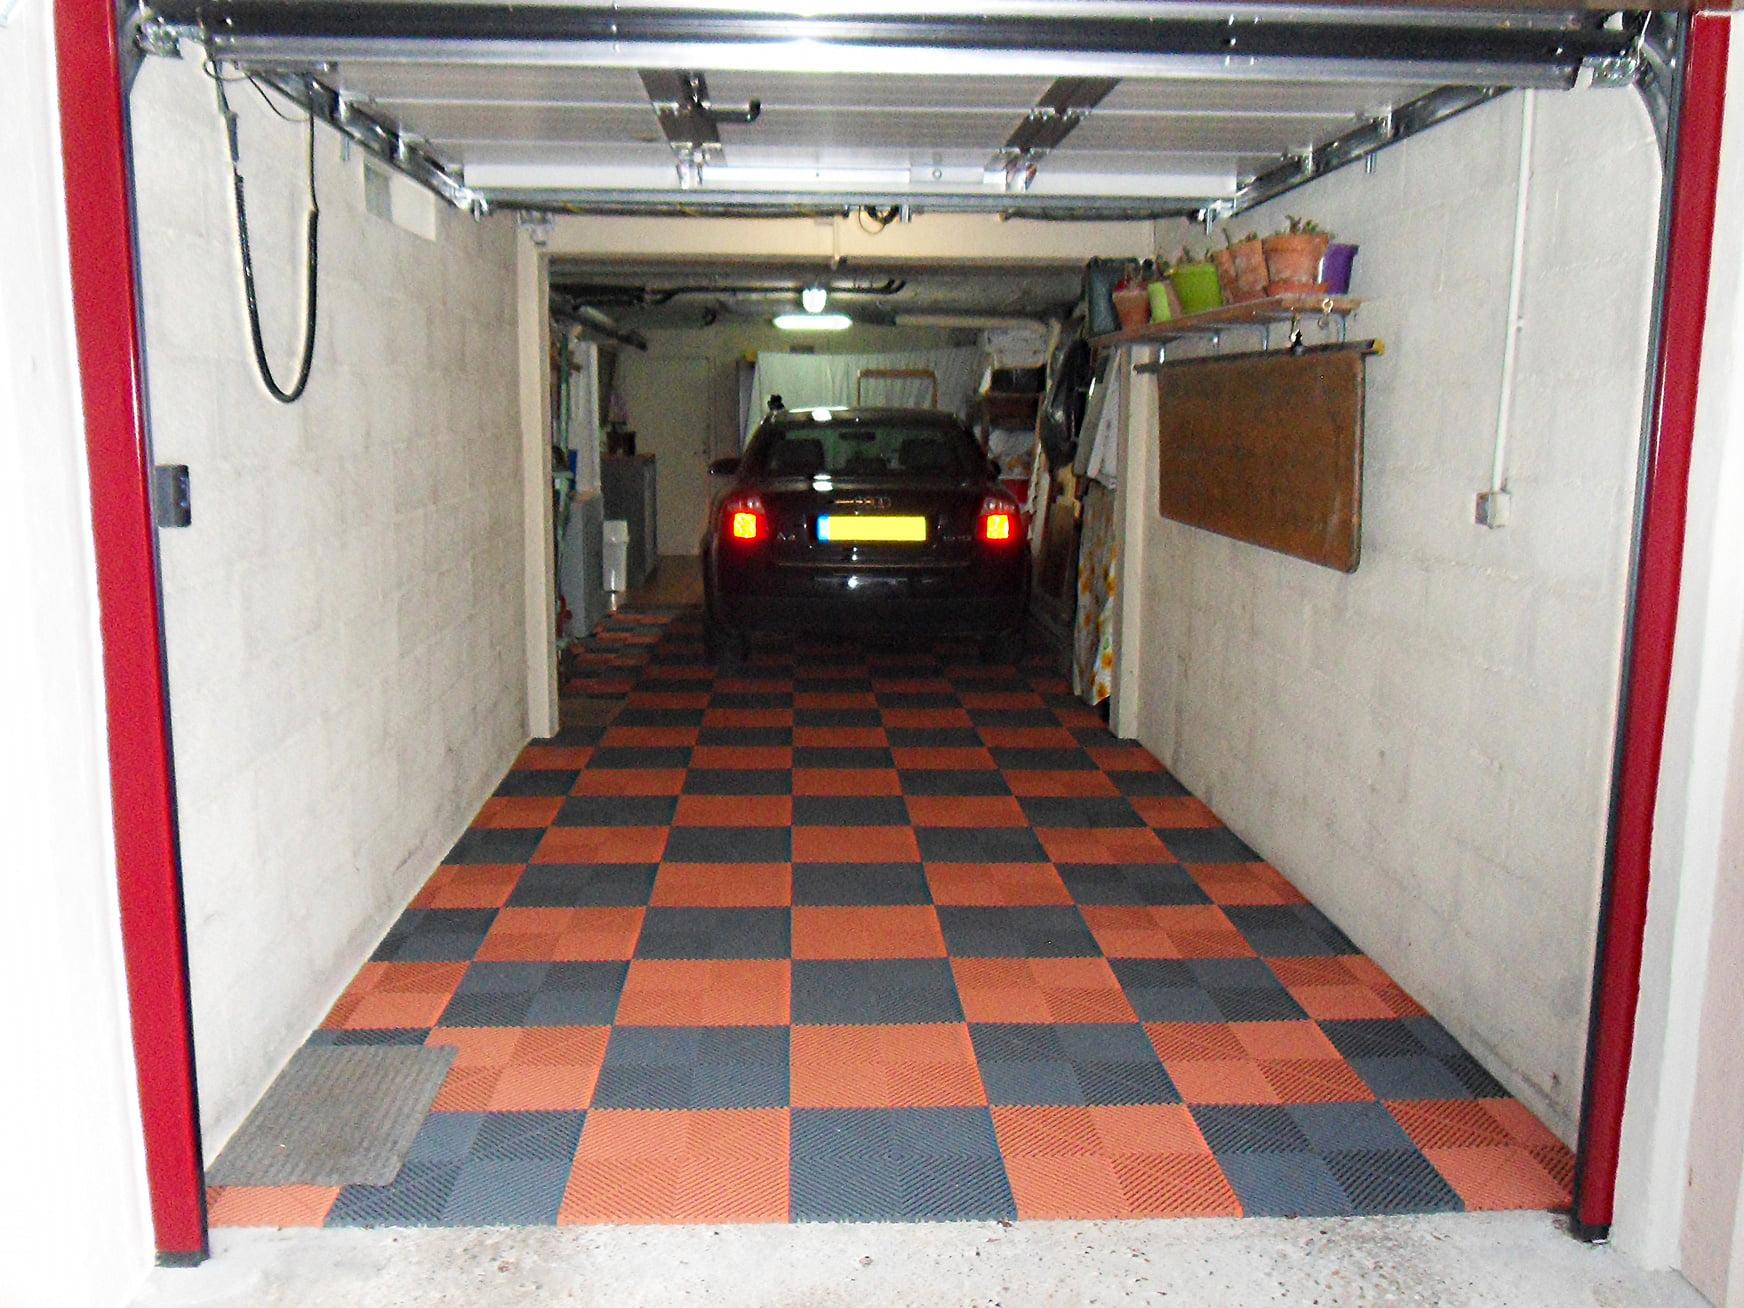 Polydal sol en damier noir et rouge garage privé